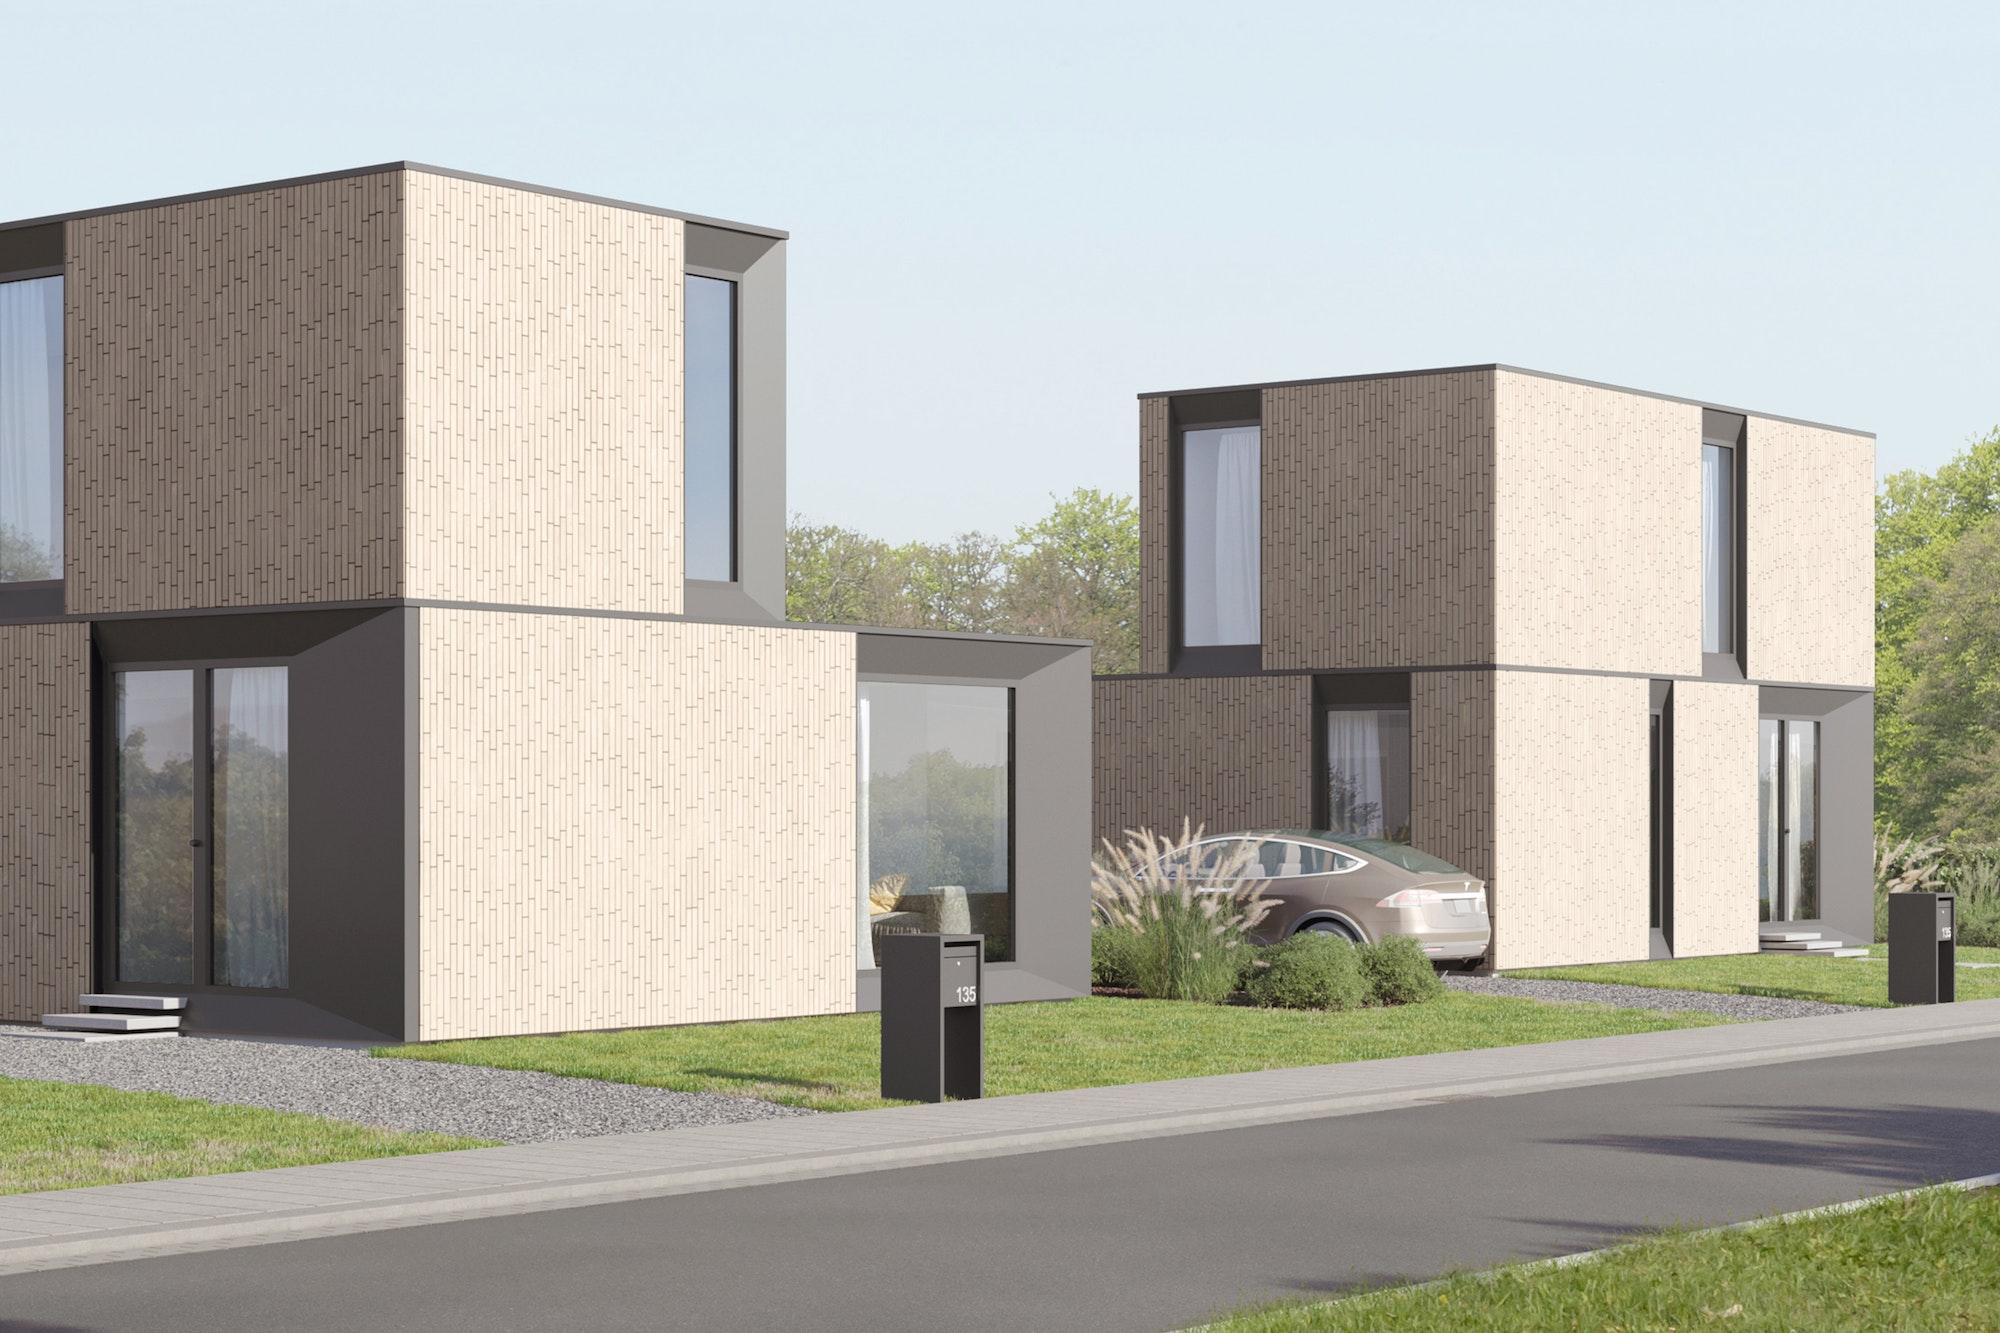 Skilpod #135 — houtskeletbouw woning met 3 slaapkamers, modern design met witte steen